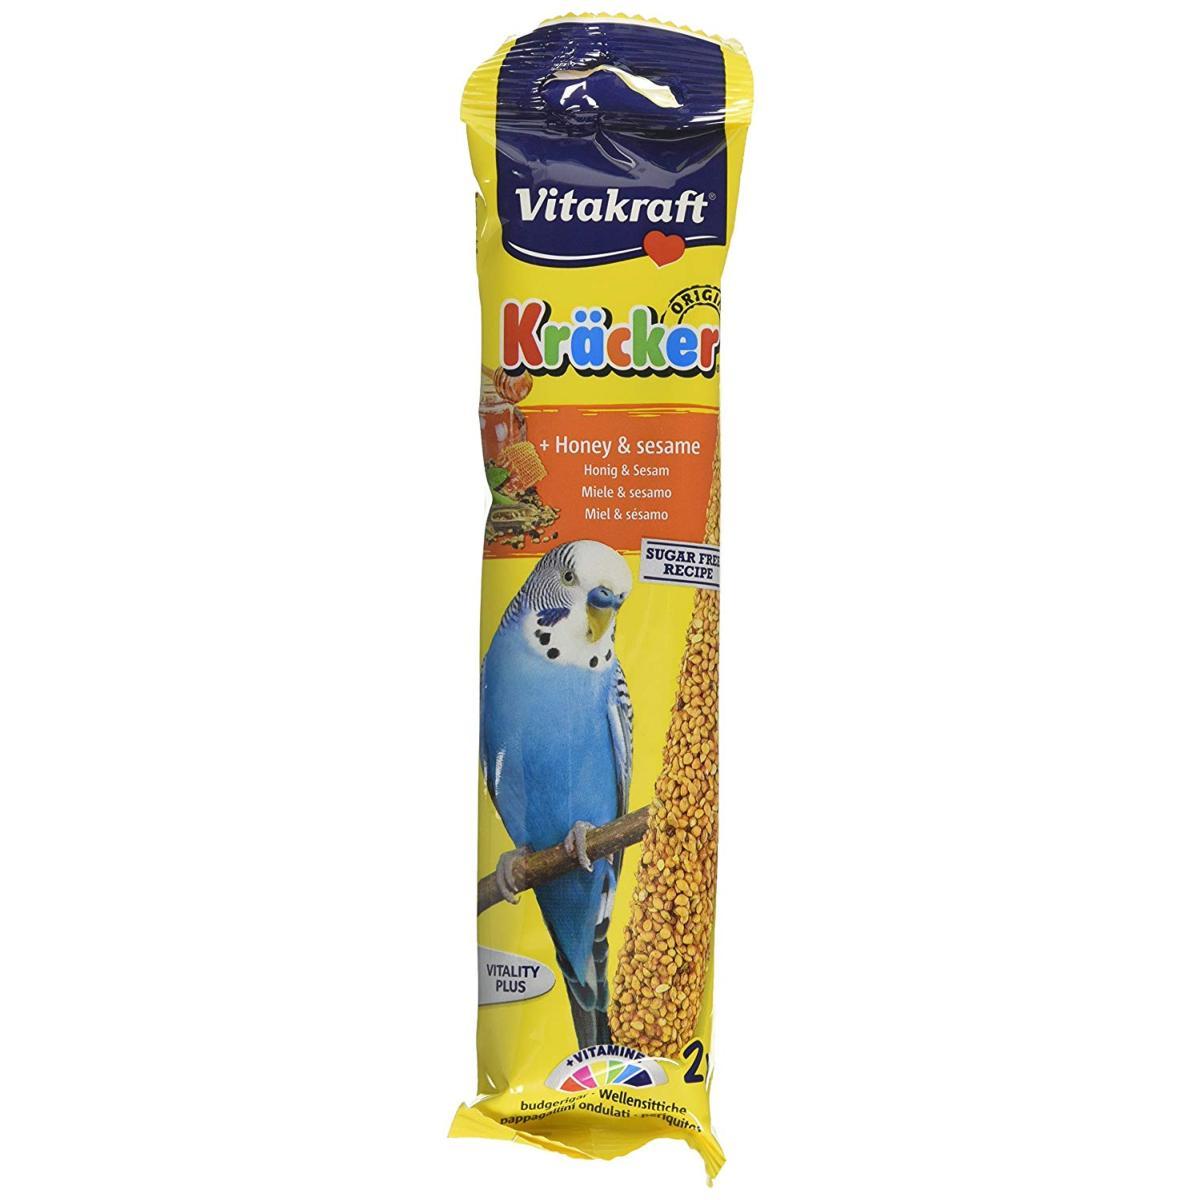 Vitakraft Kracker Budgie Treat Sticks (2 Pack) - Honey & Sesame